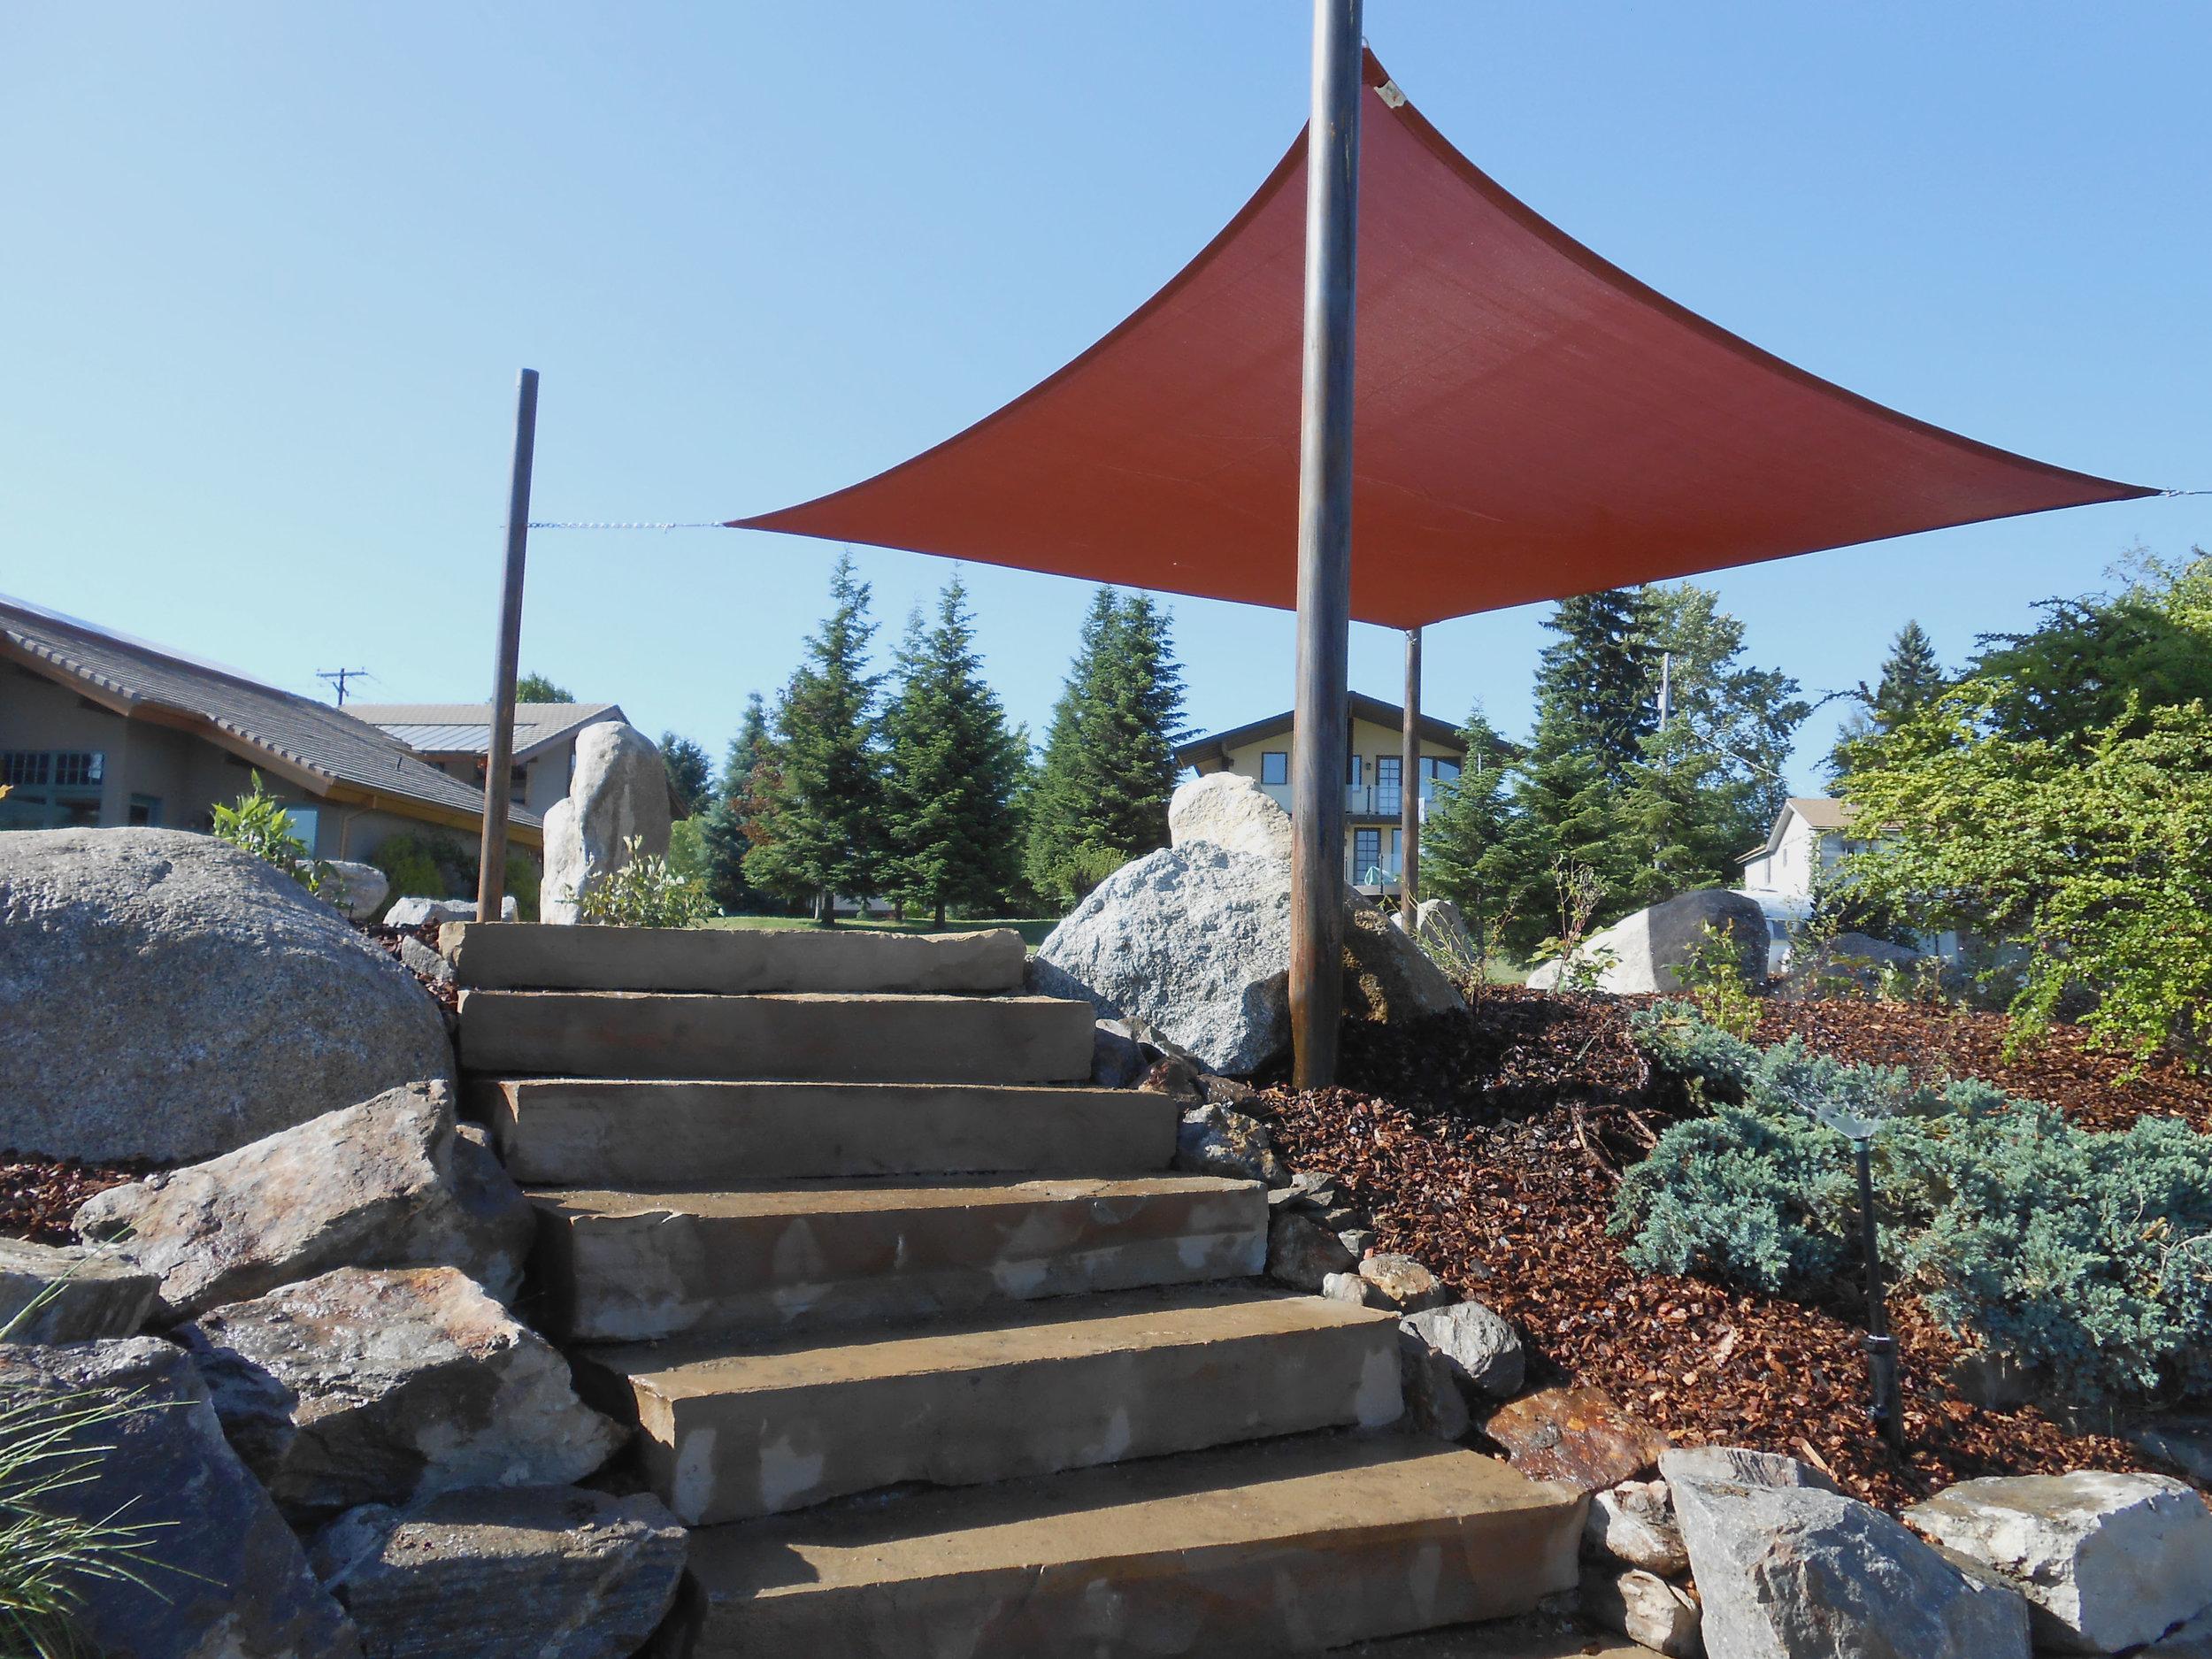 square shade sail and stone steps